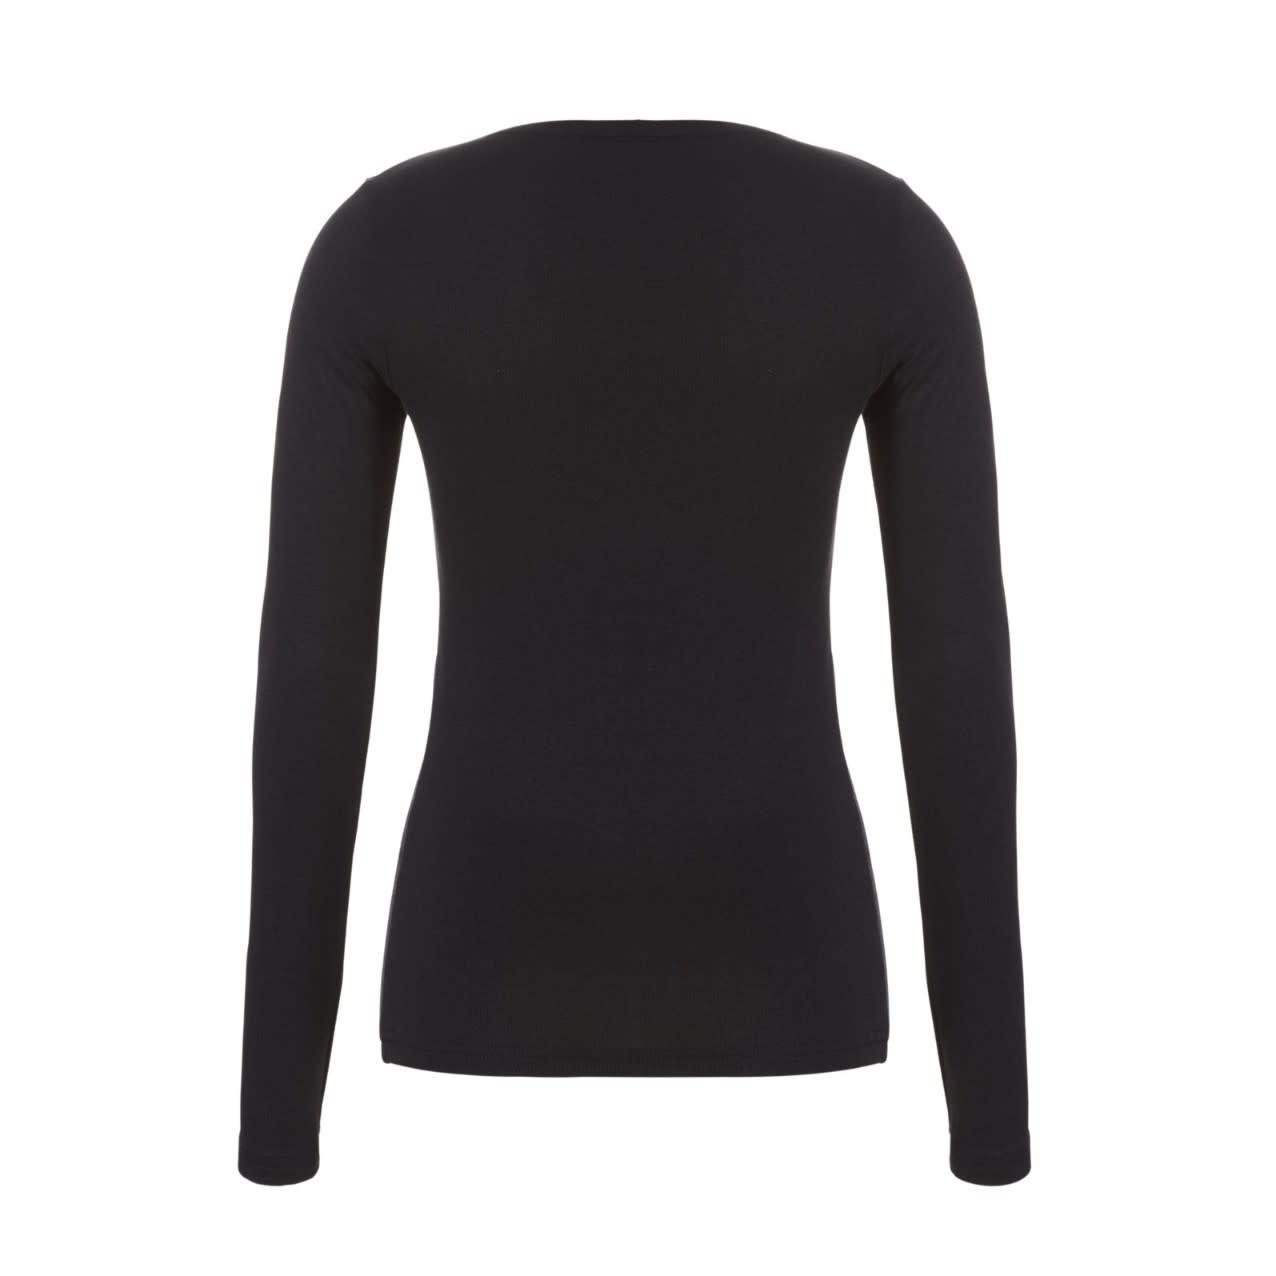 Thermo T-shirt met lange mouw 30241 - zwart-2